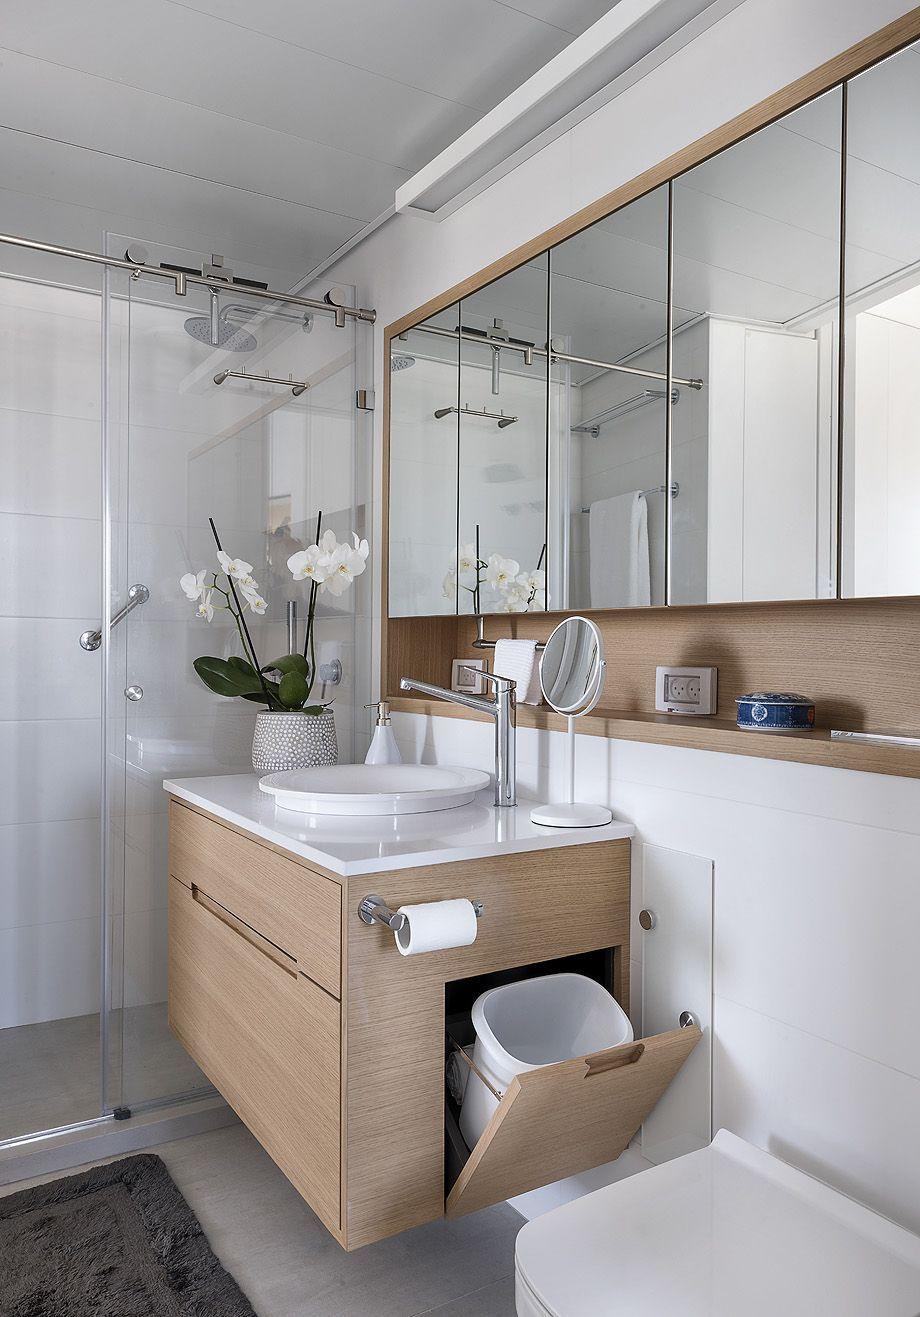 Photo of Un apartamento aprovechado al máximo, por XS Studio,  #Apartamento #aprovechado #Baño